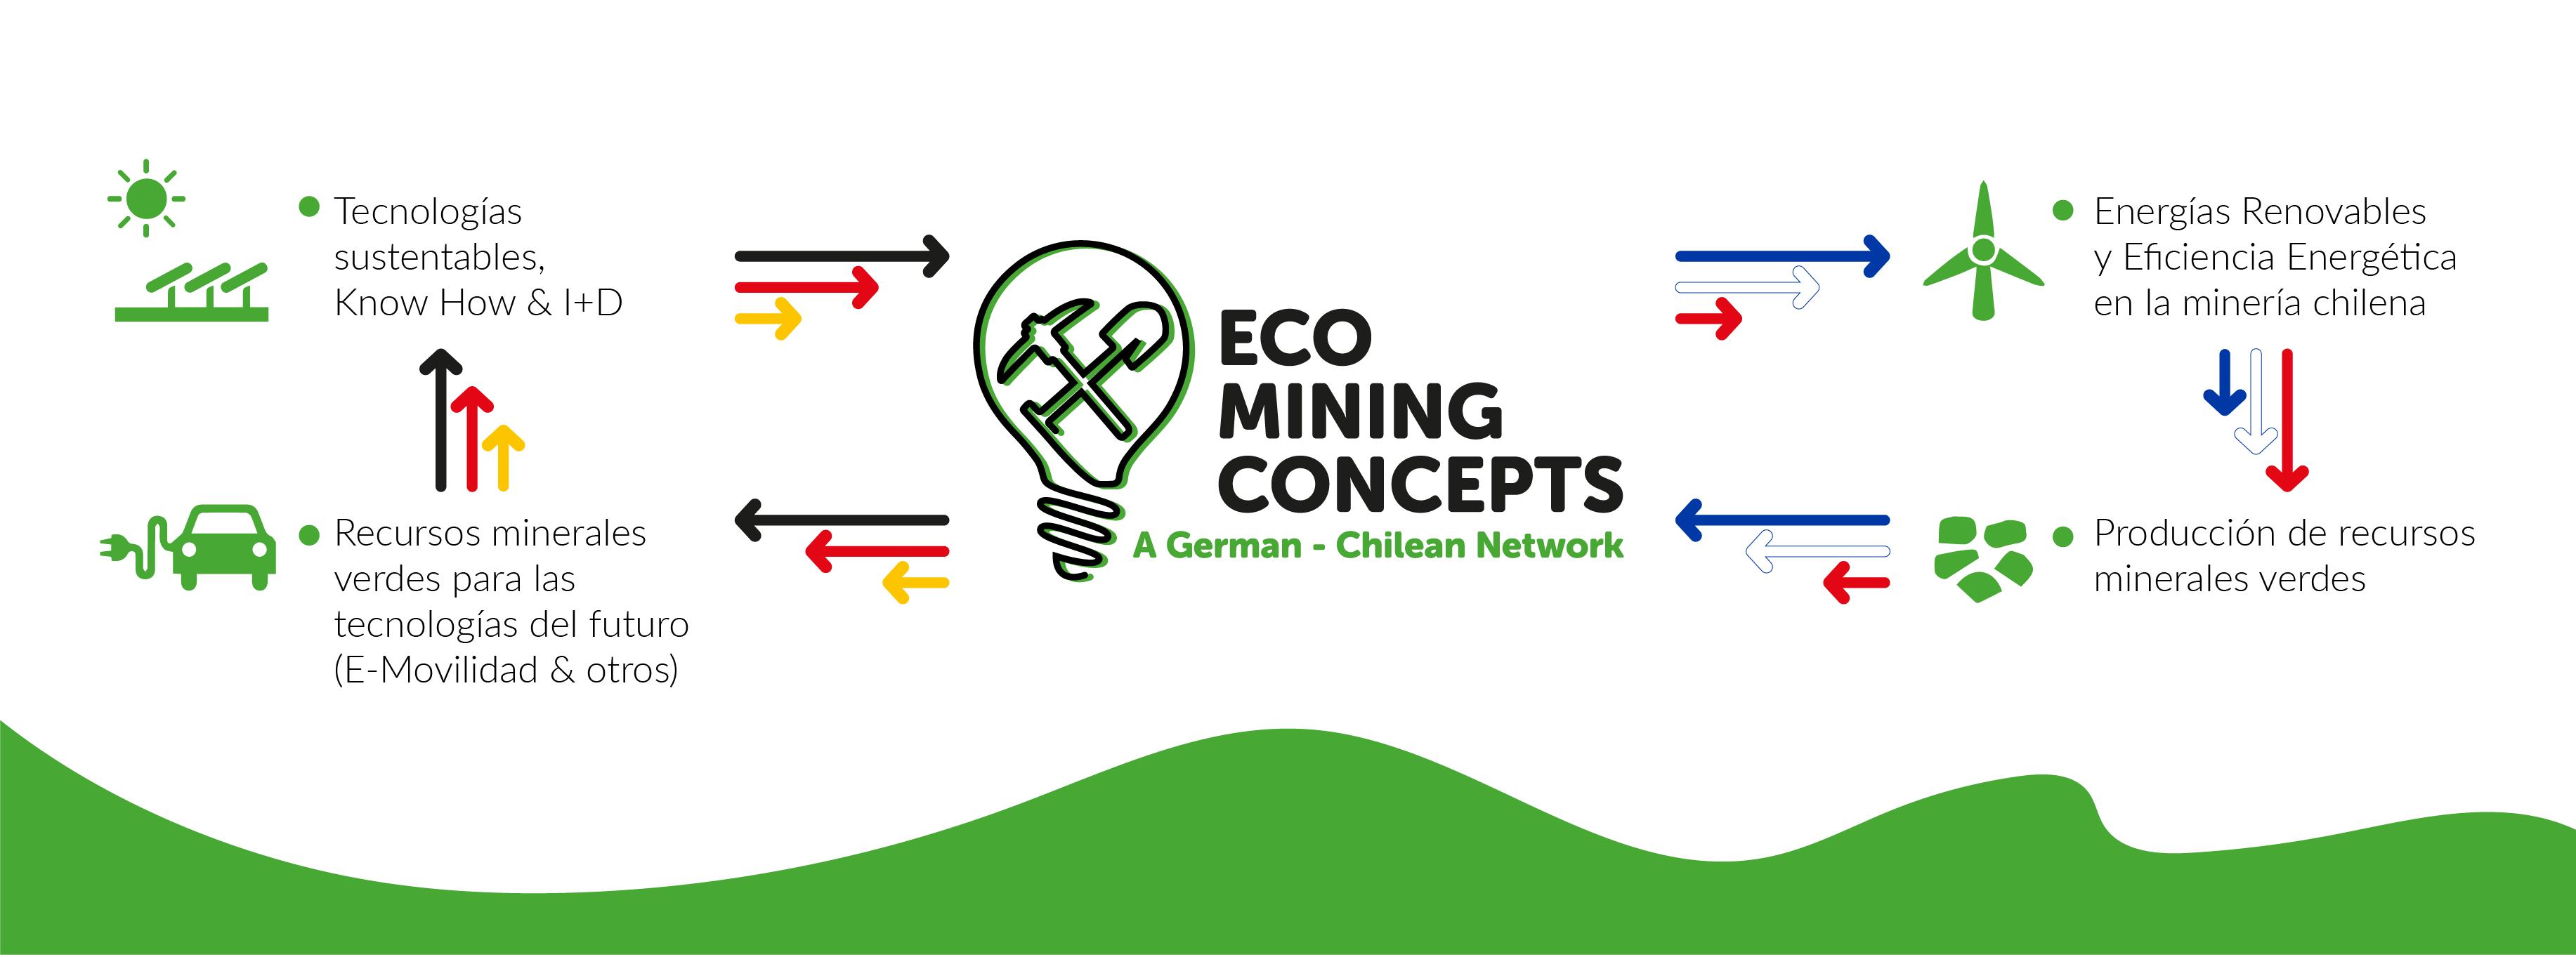 eco-mining-proyects-el-proyecto-es